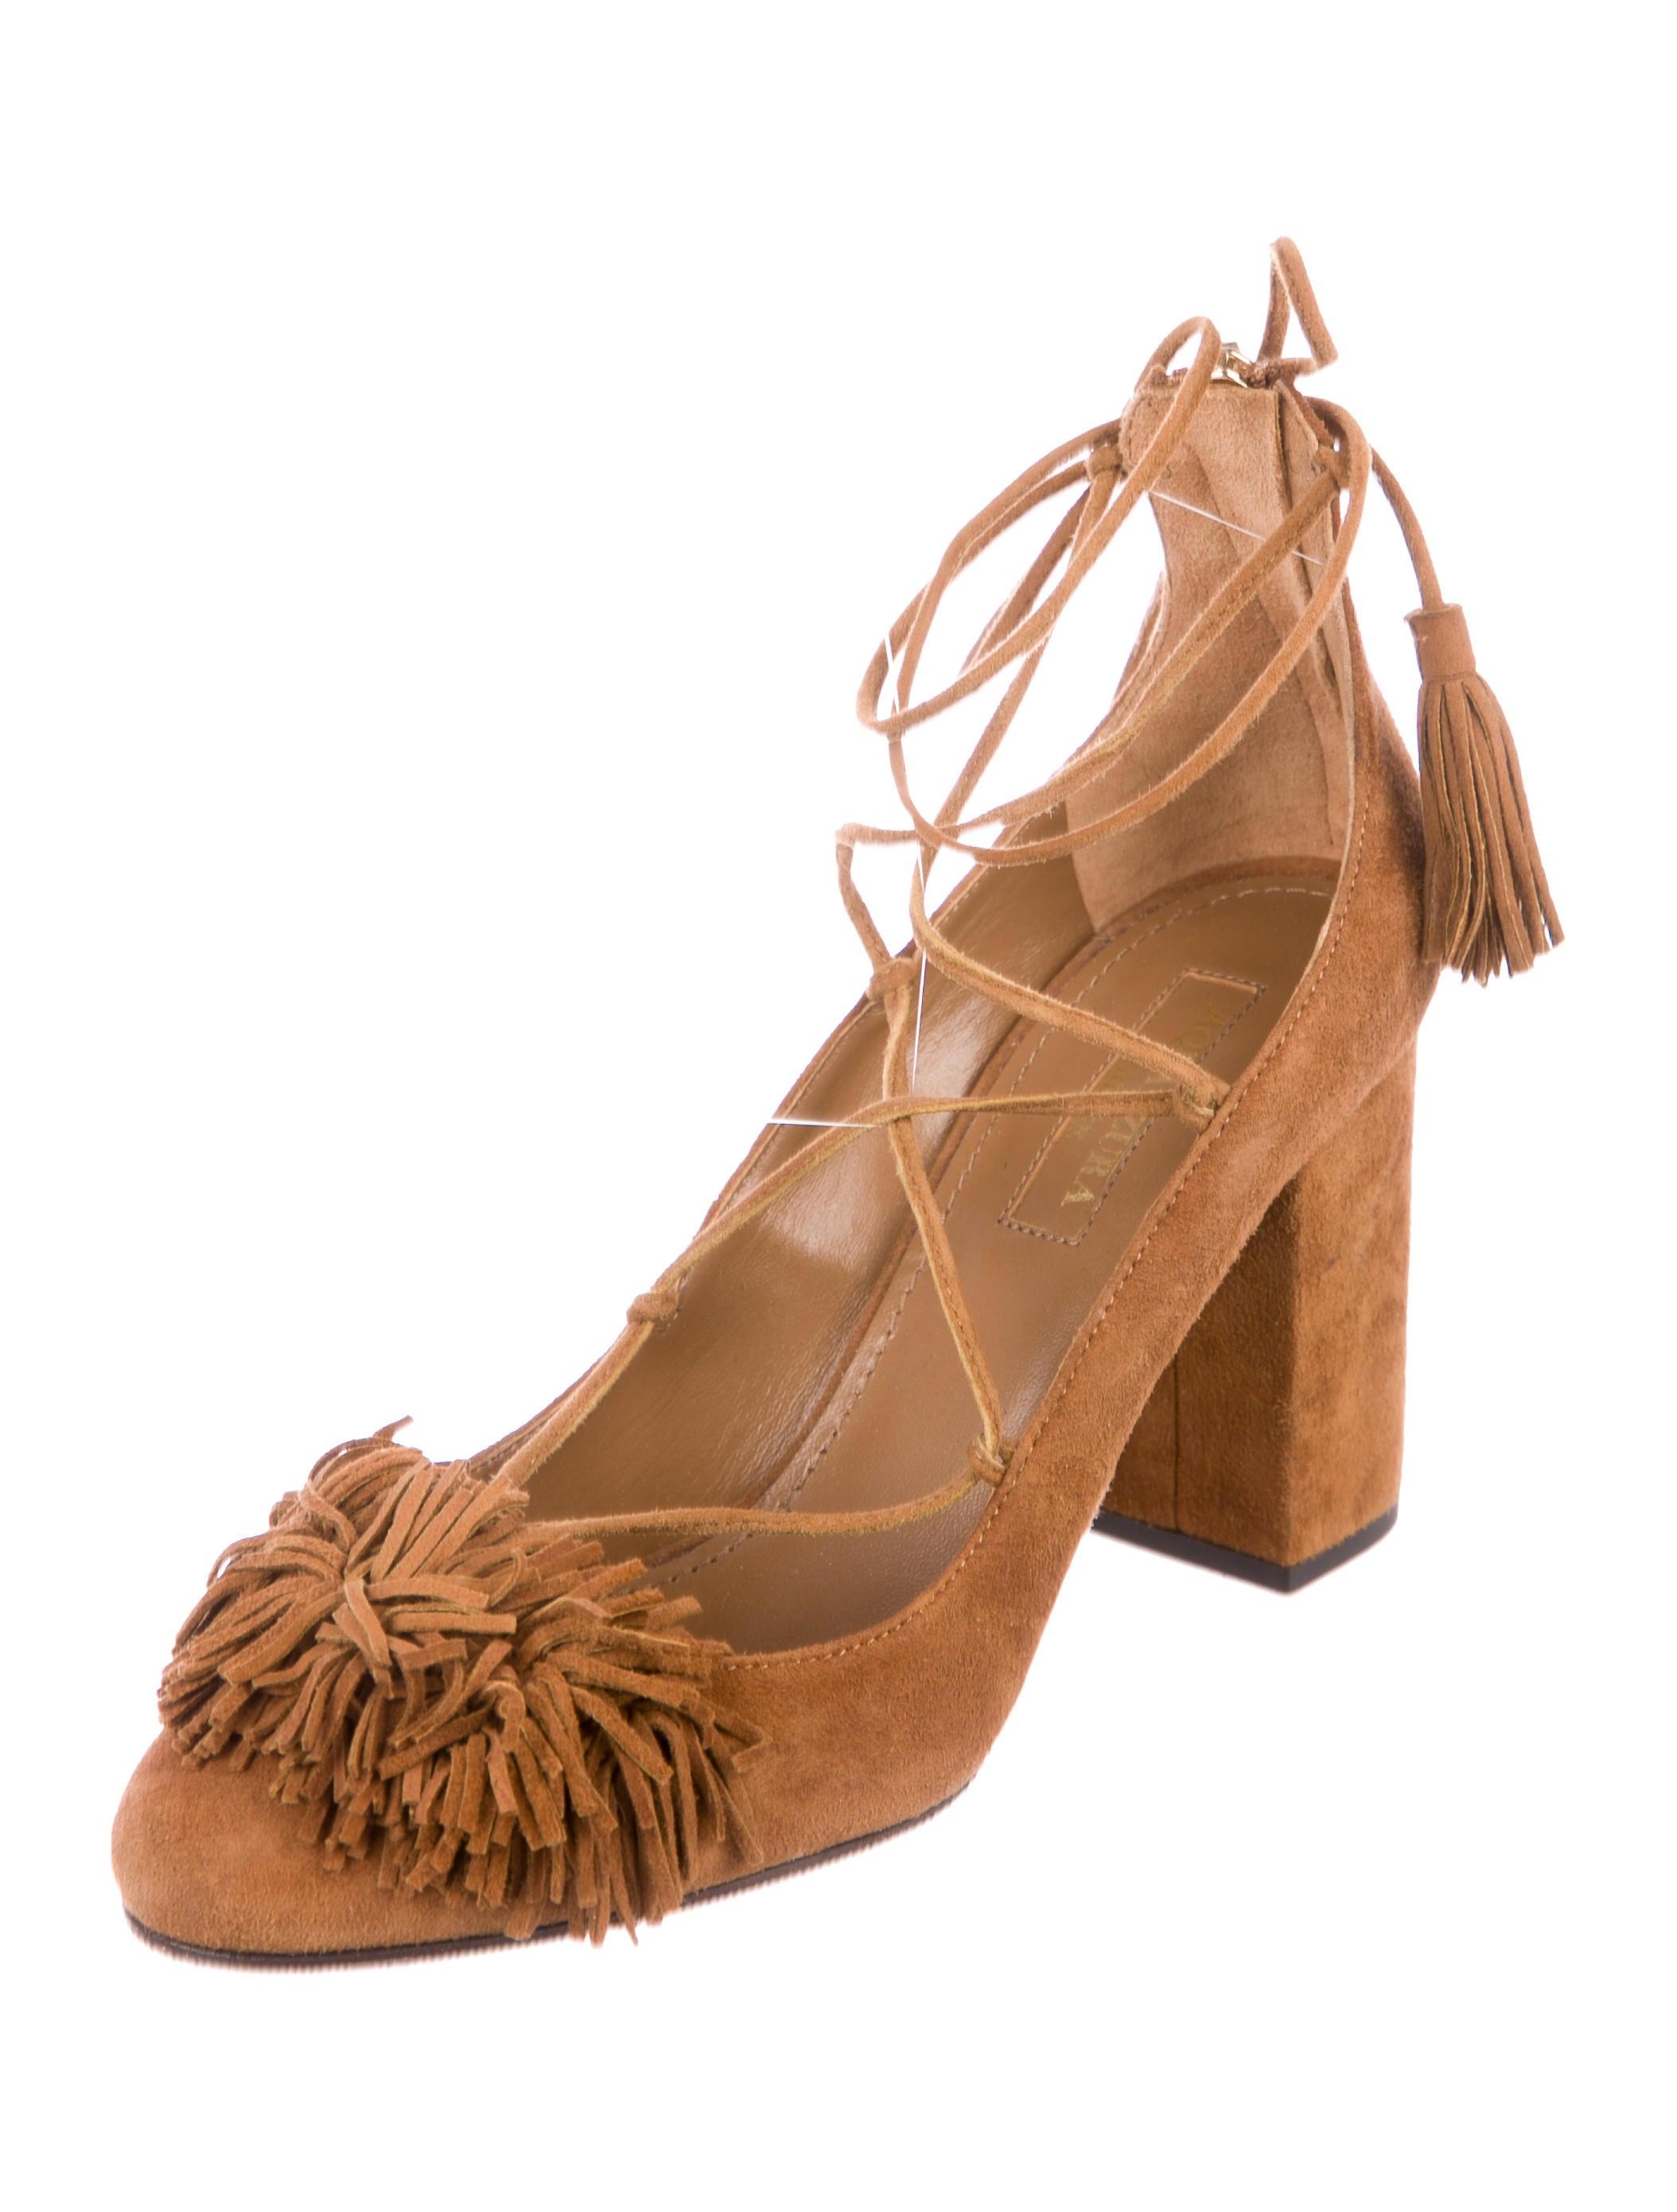 Aquazzura Wild Suede Pumps reliable fashion Style choice sale online buy cheap websites yrwTP3